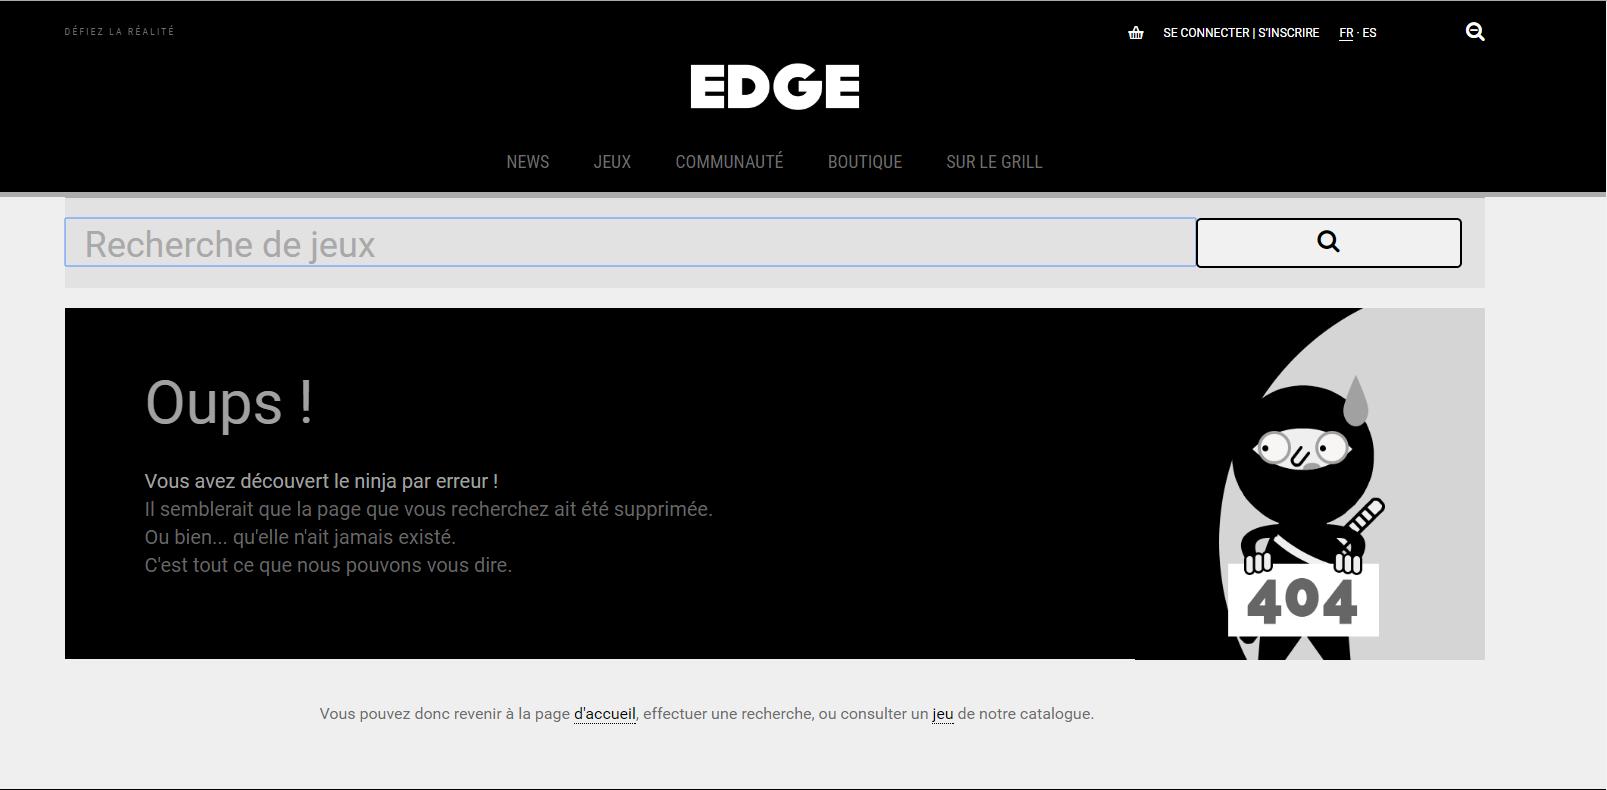 SEO page 404 edge